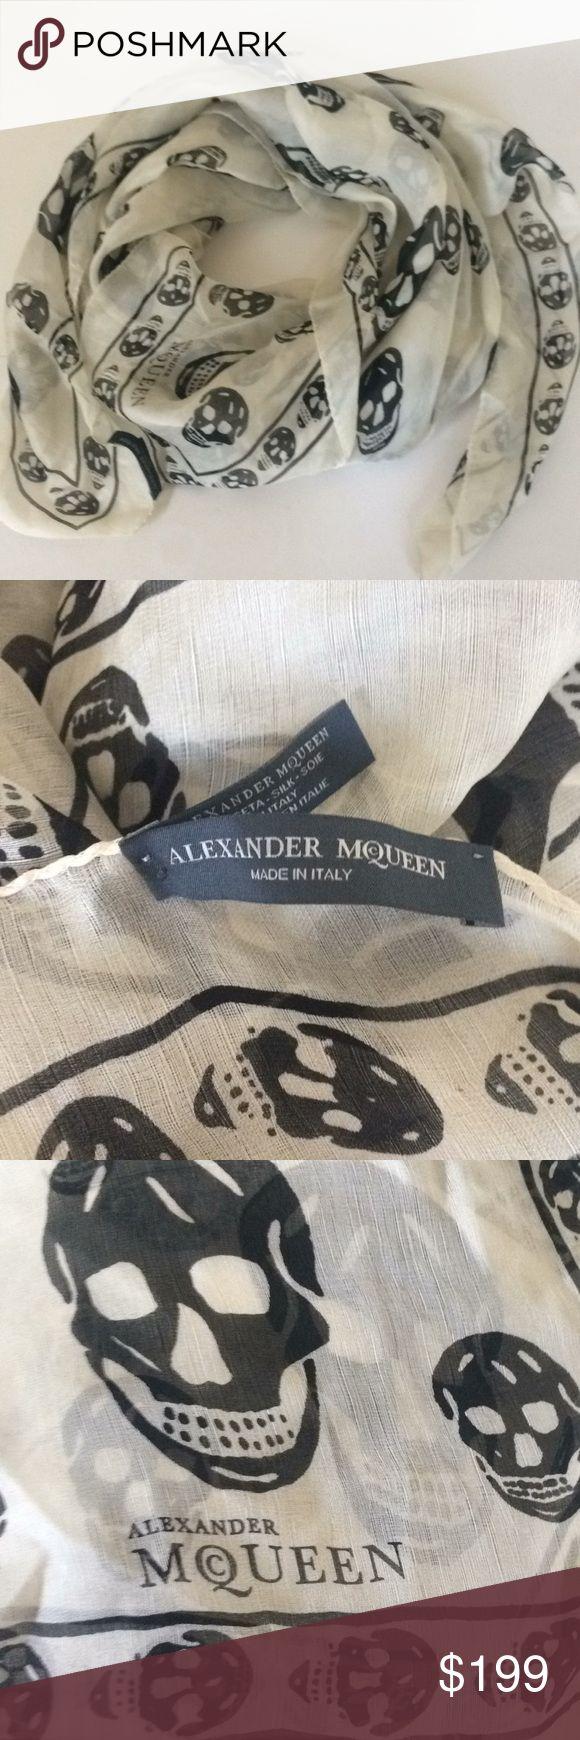 Alexander McQueen Silk Skull scarf Authentic Alexander McQueen skull scarf. Excellent condition!! Alexander McQueen Accessories Scarves & Wraps